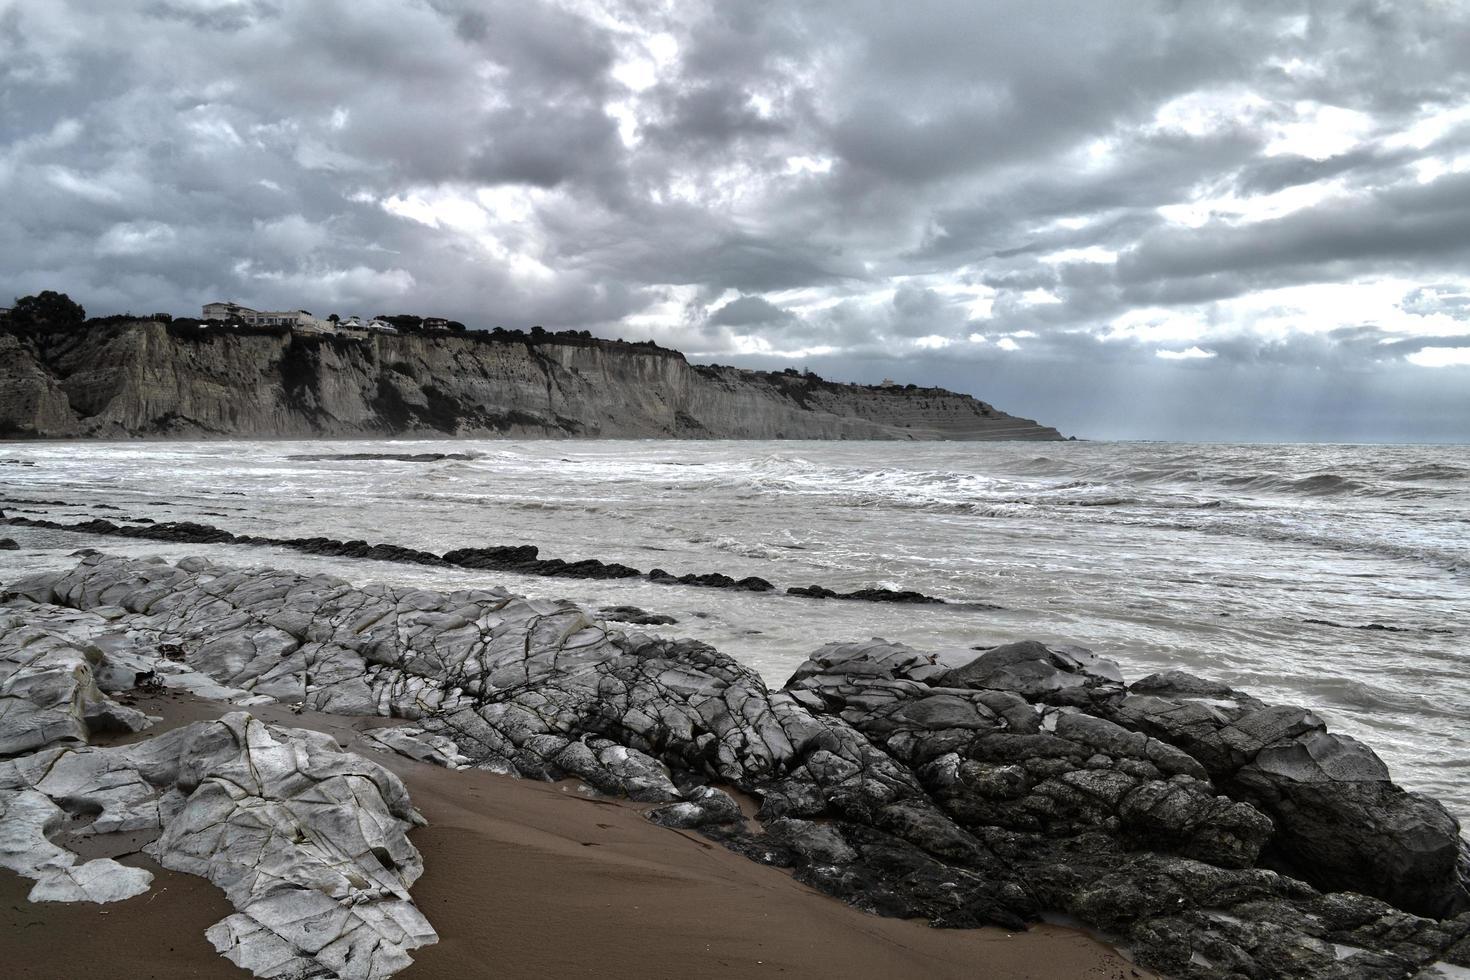 graue Felsen nahe Meer unter grauem Himmel foto